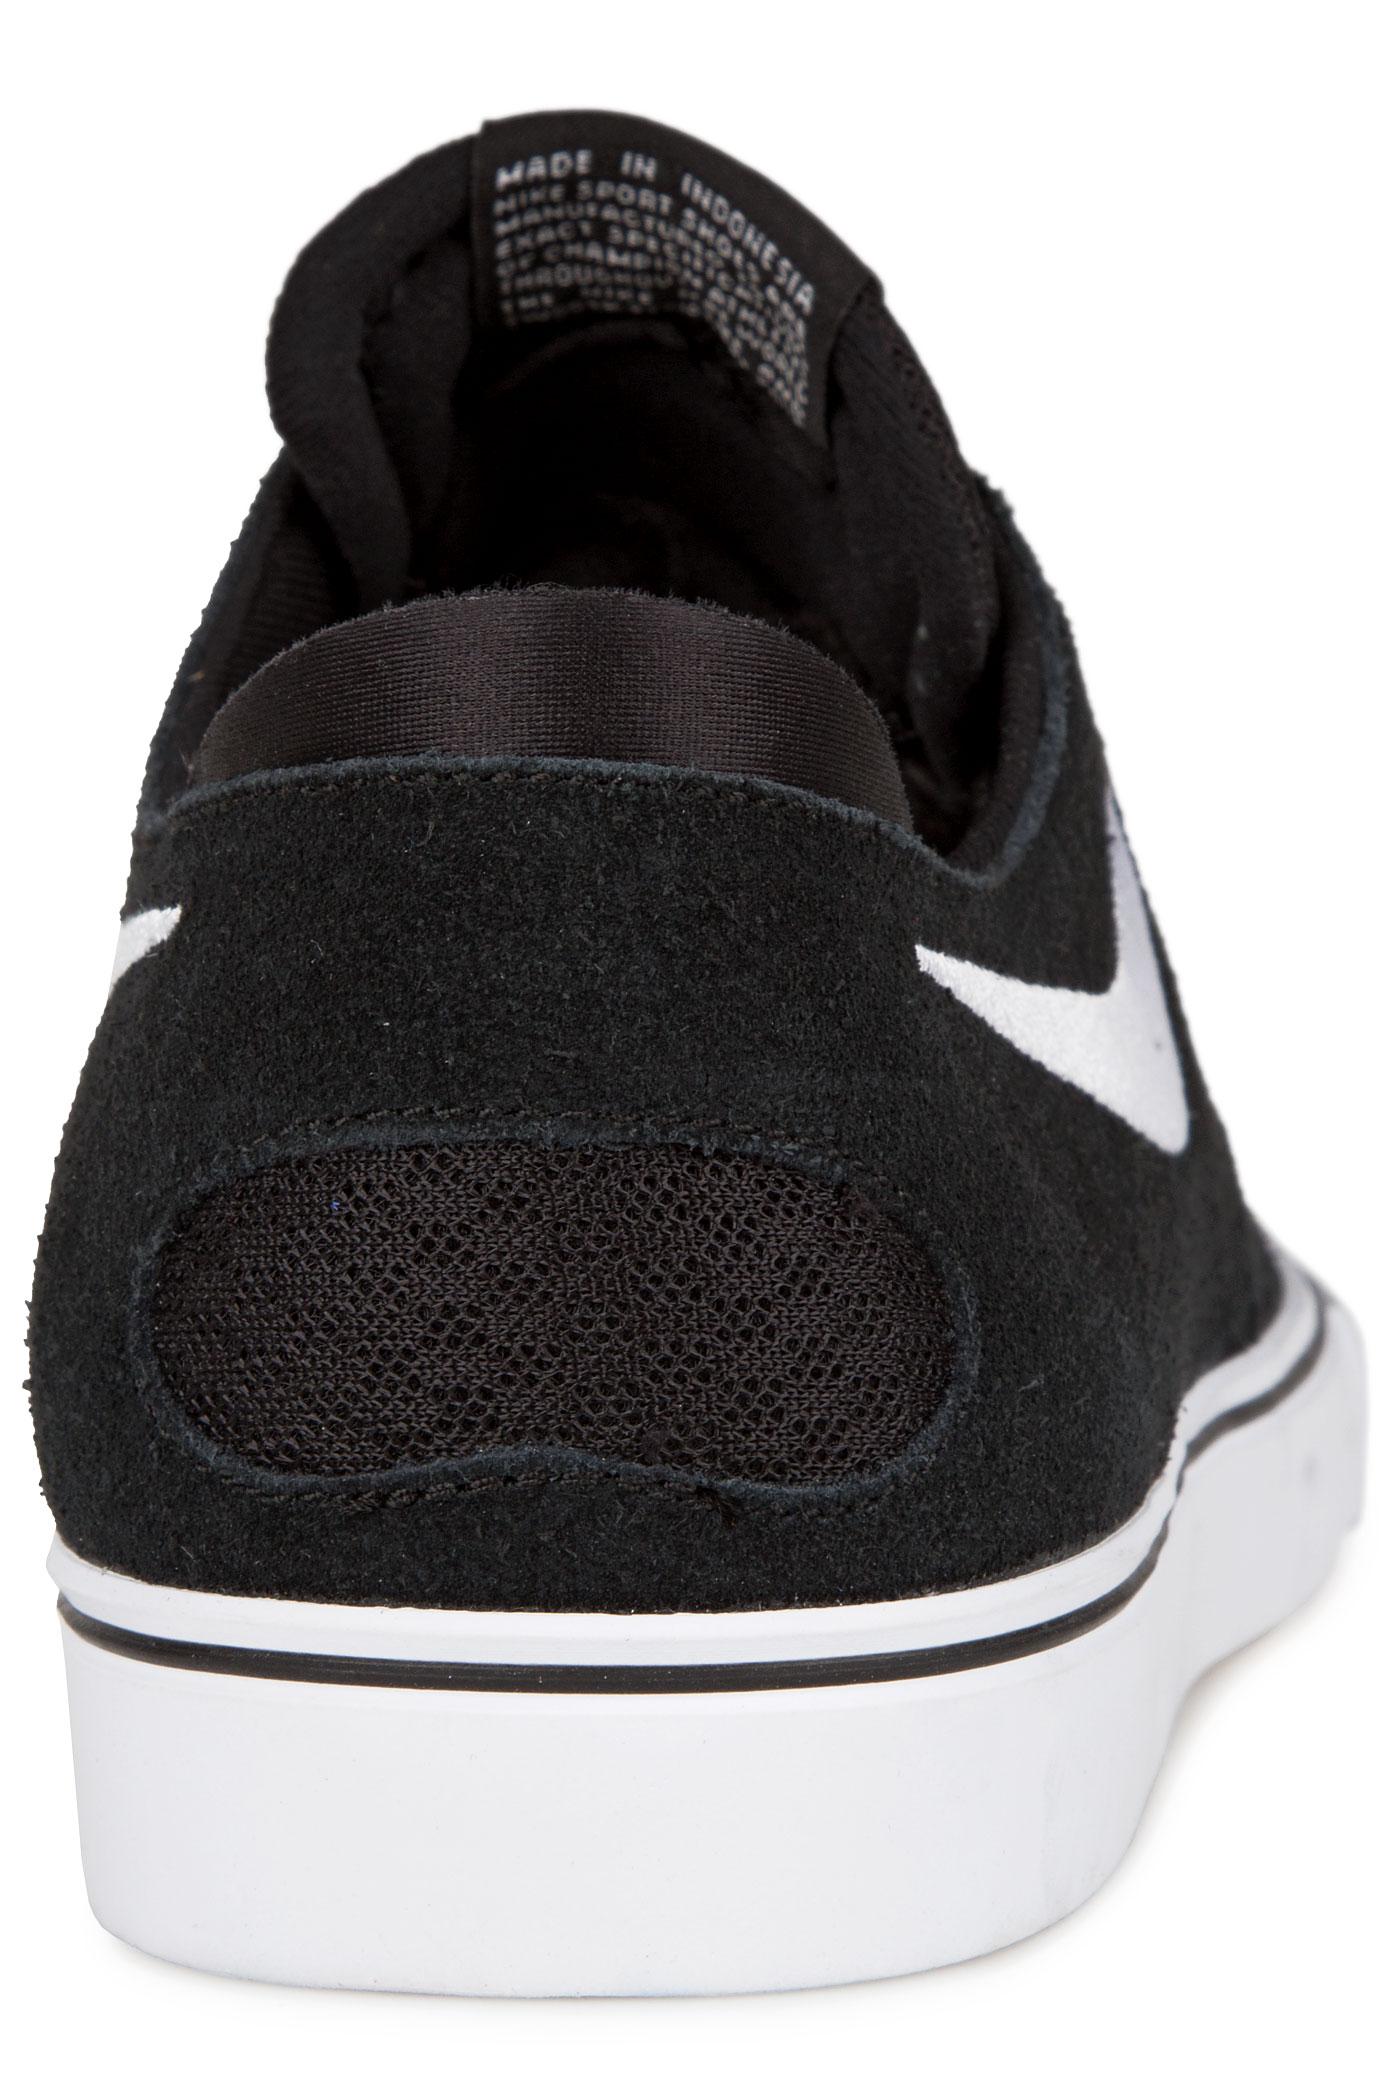 0665ee6bd0d0 Nike SB Zoom Oneshot Shoe (black white gum light brown) buy at ...